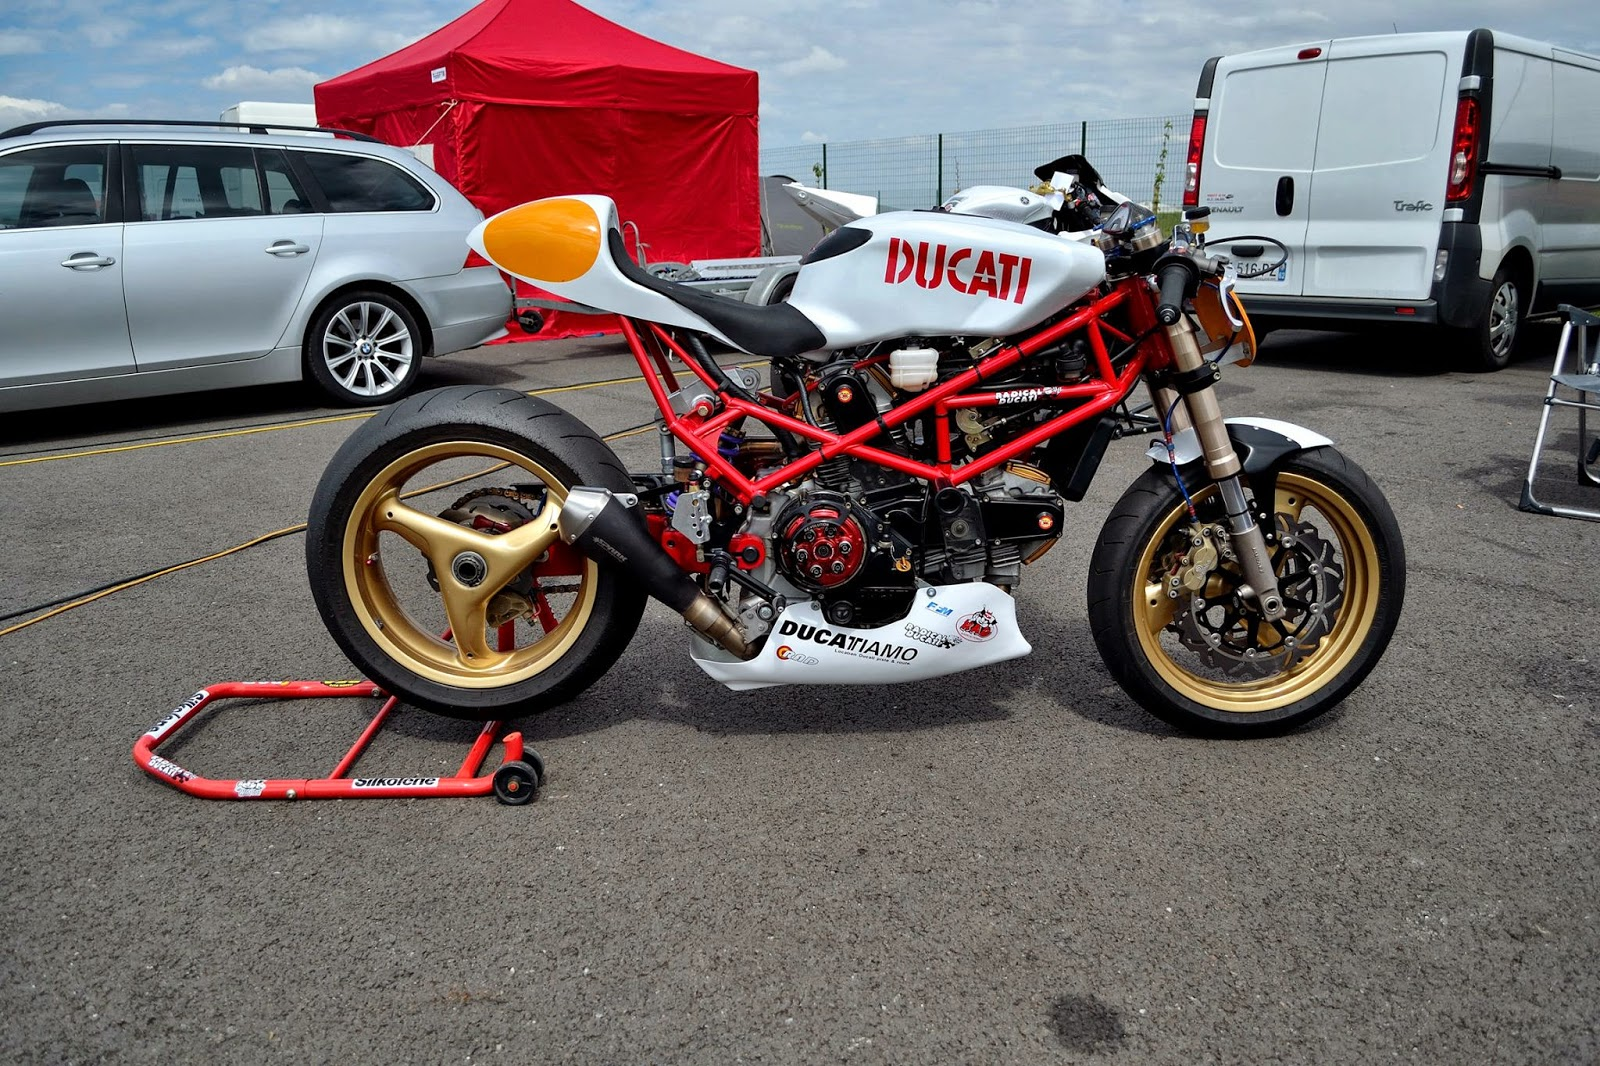 BUBBLE VISOR: Radical Ducati is still alive